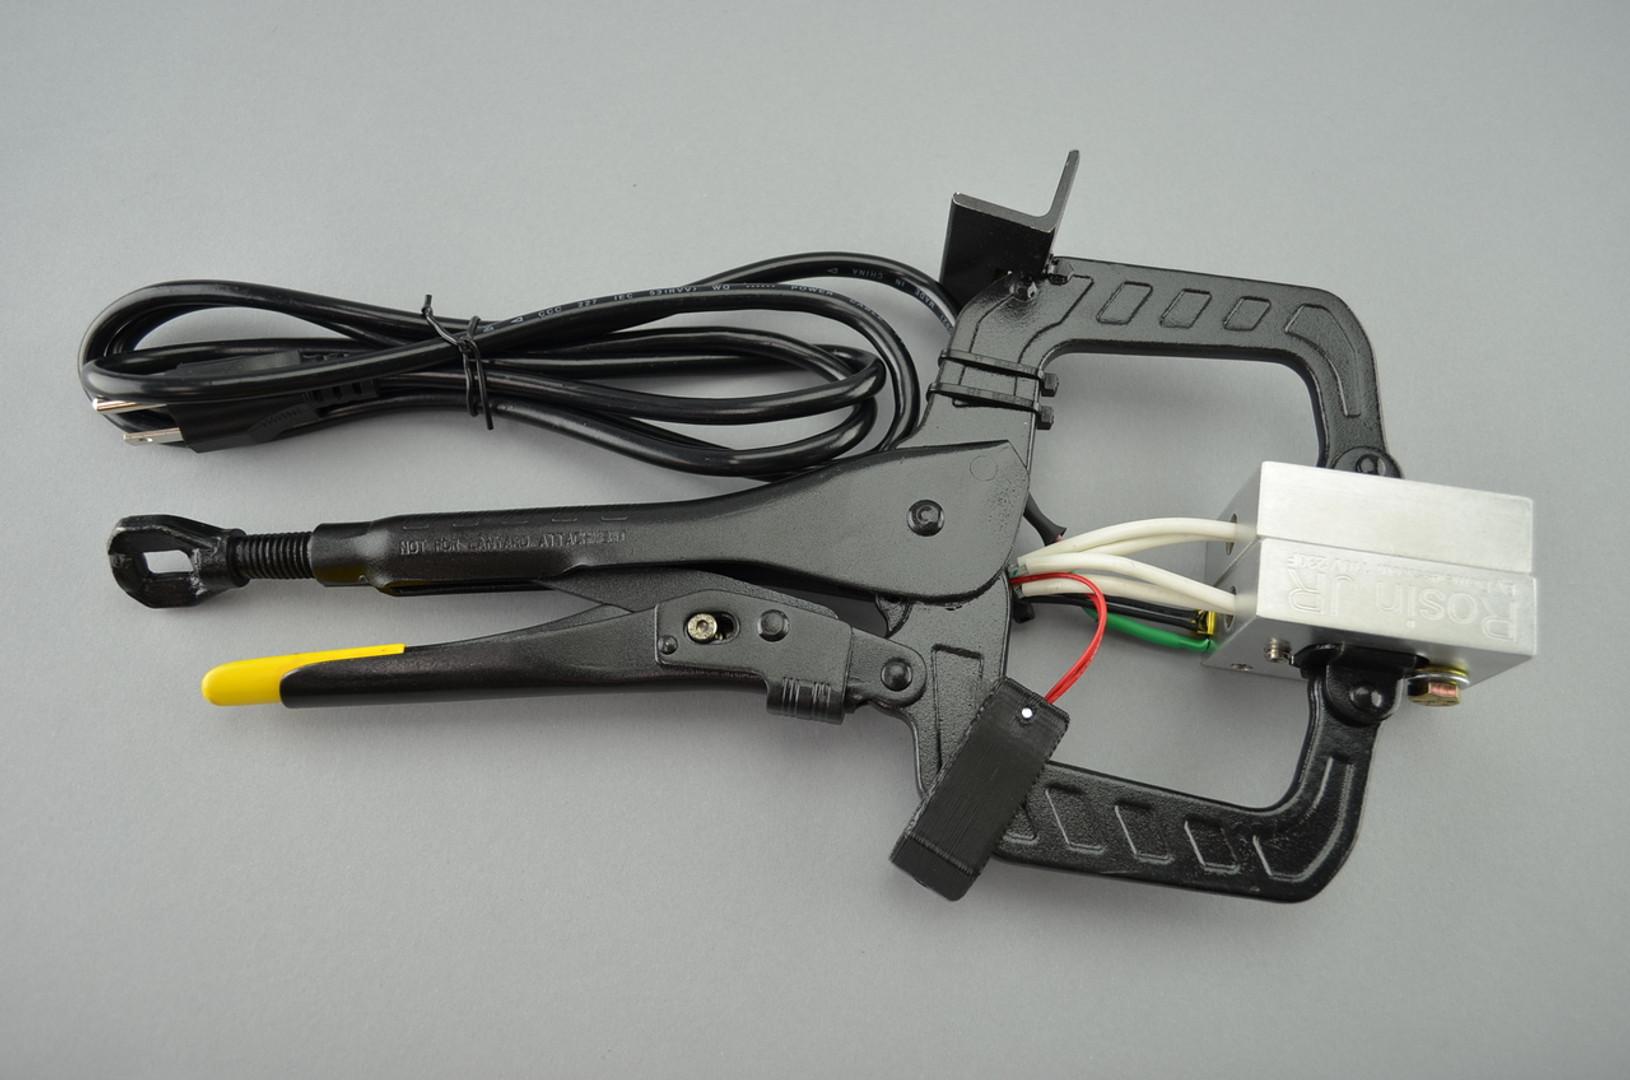 710 WHIP - Rosin JR Heavy-Duty Handheld Vice Grip Rosin Press